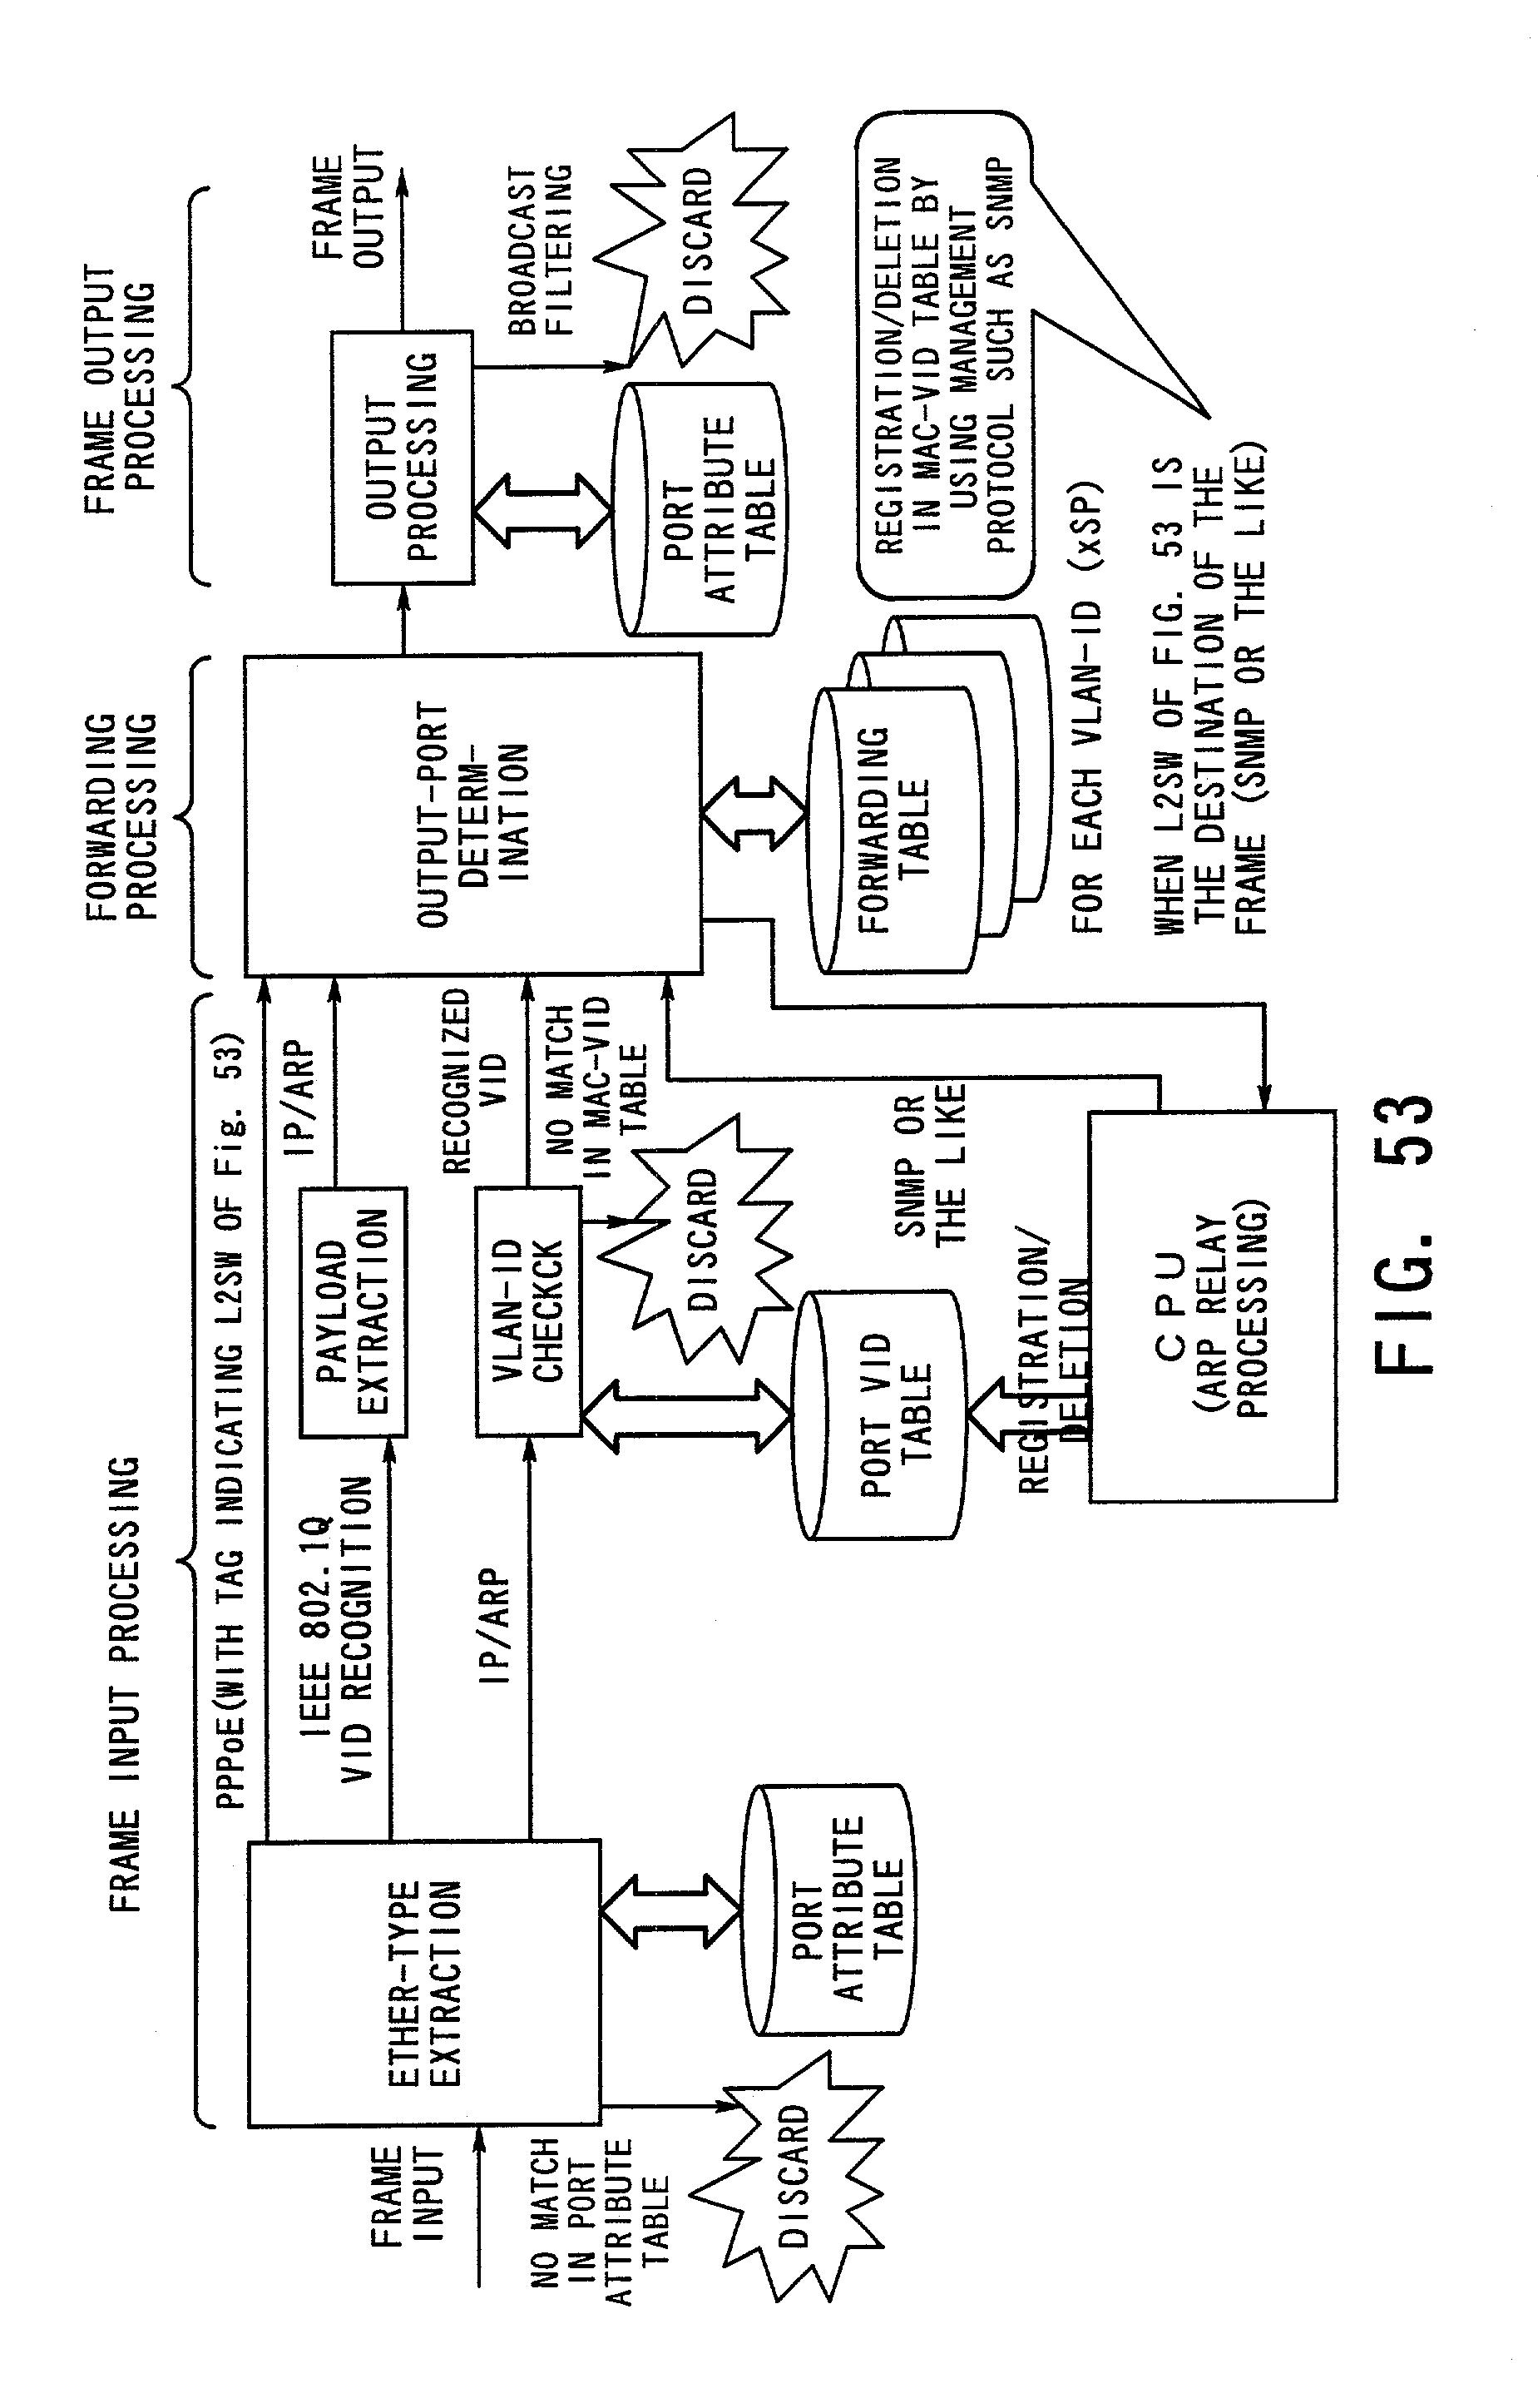 Patent US 7,469,298 B2